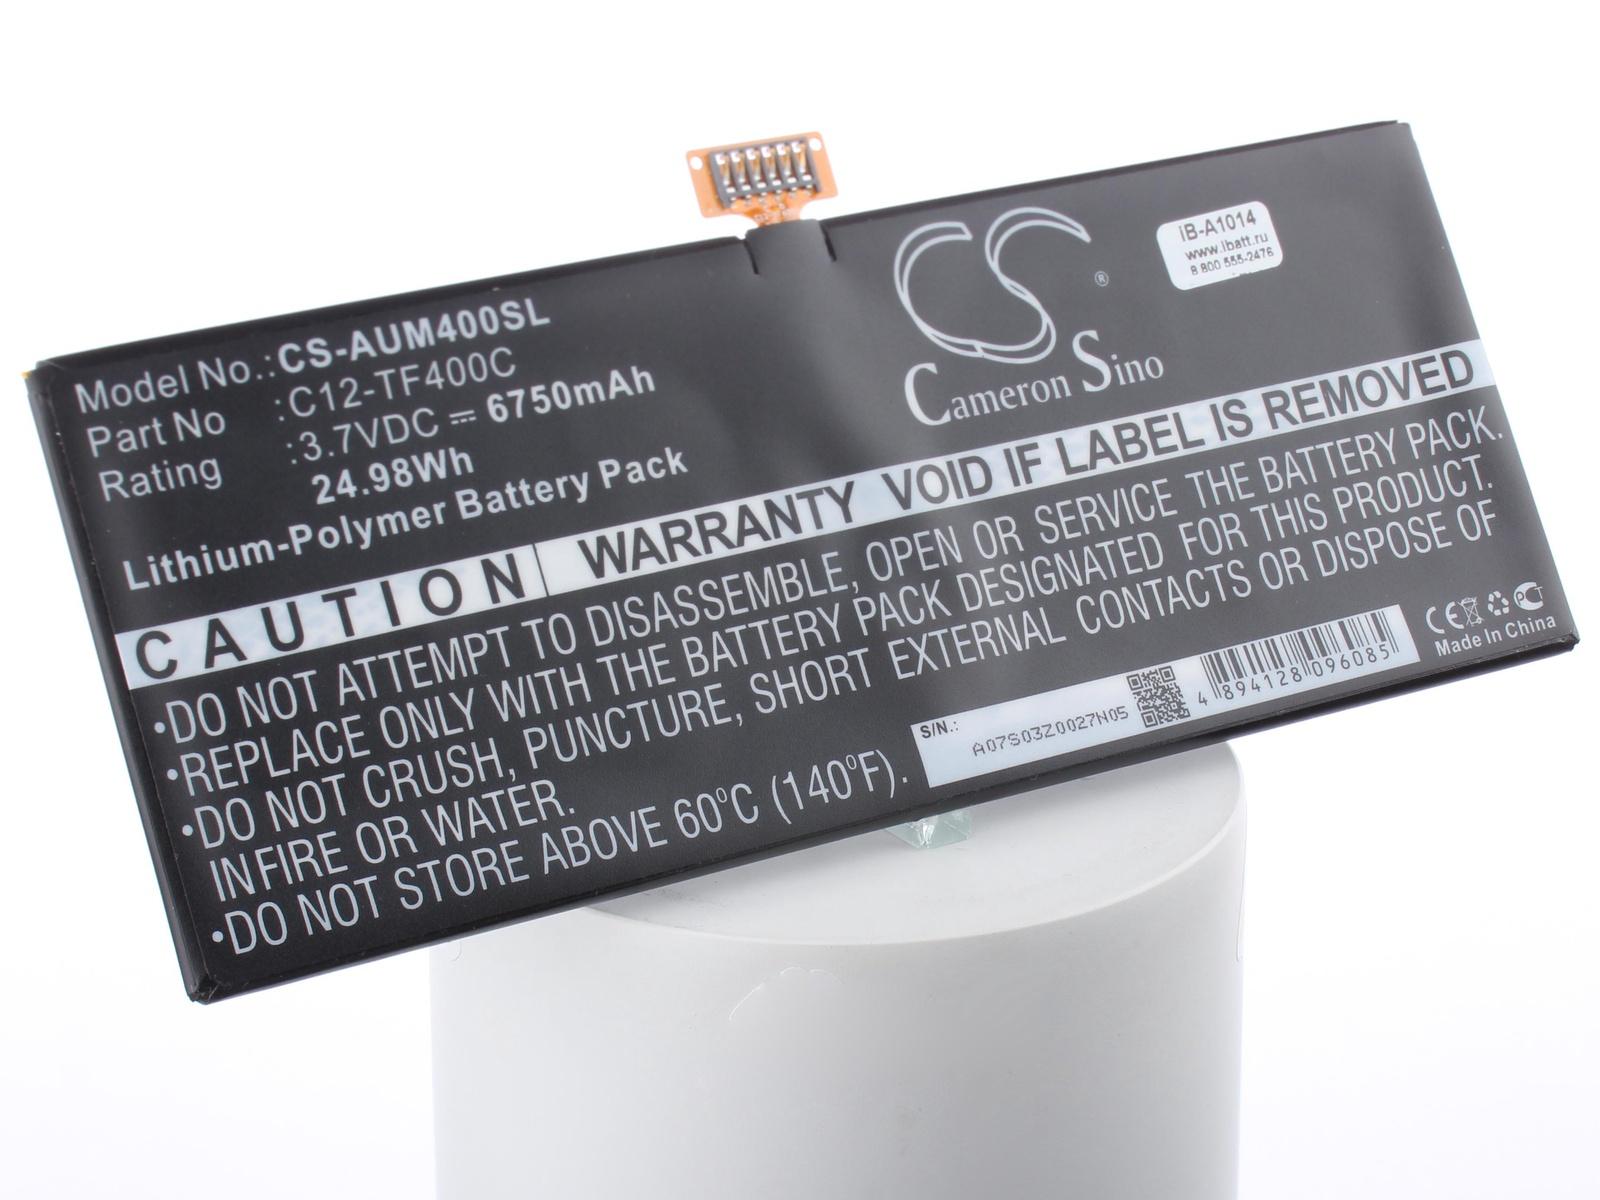 Аккумуляторная батарея iBatt iB-A1-A1014 6750mAh для ноутбуков Asus C12-TF400C, iB-A1014,